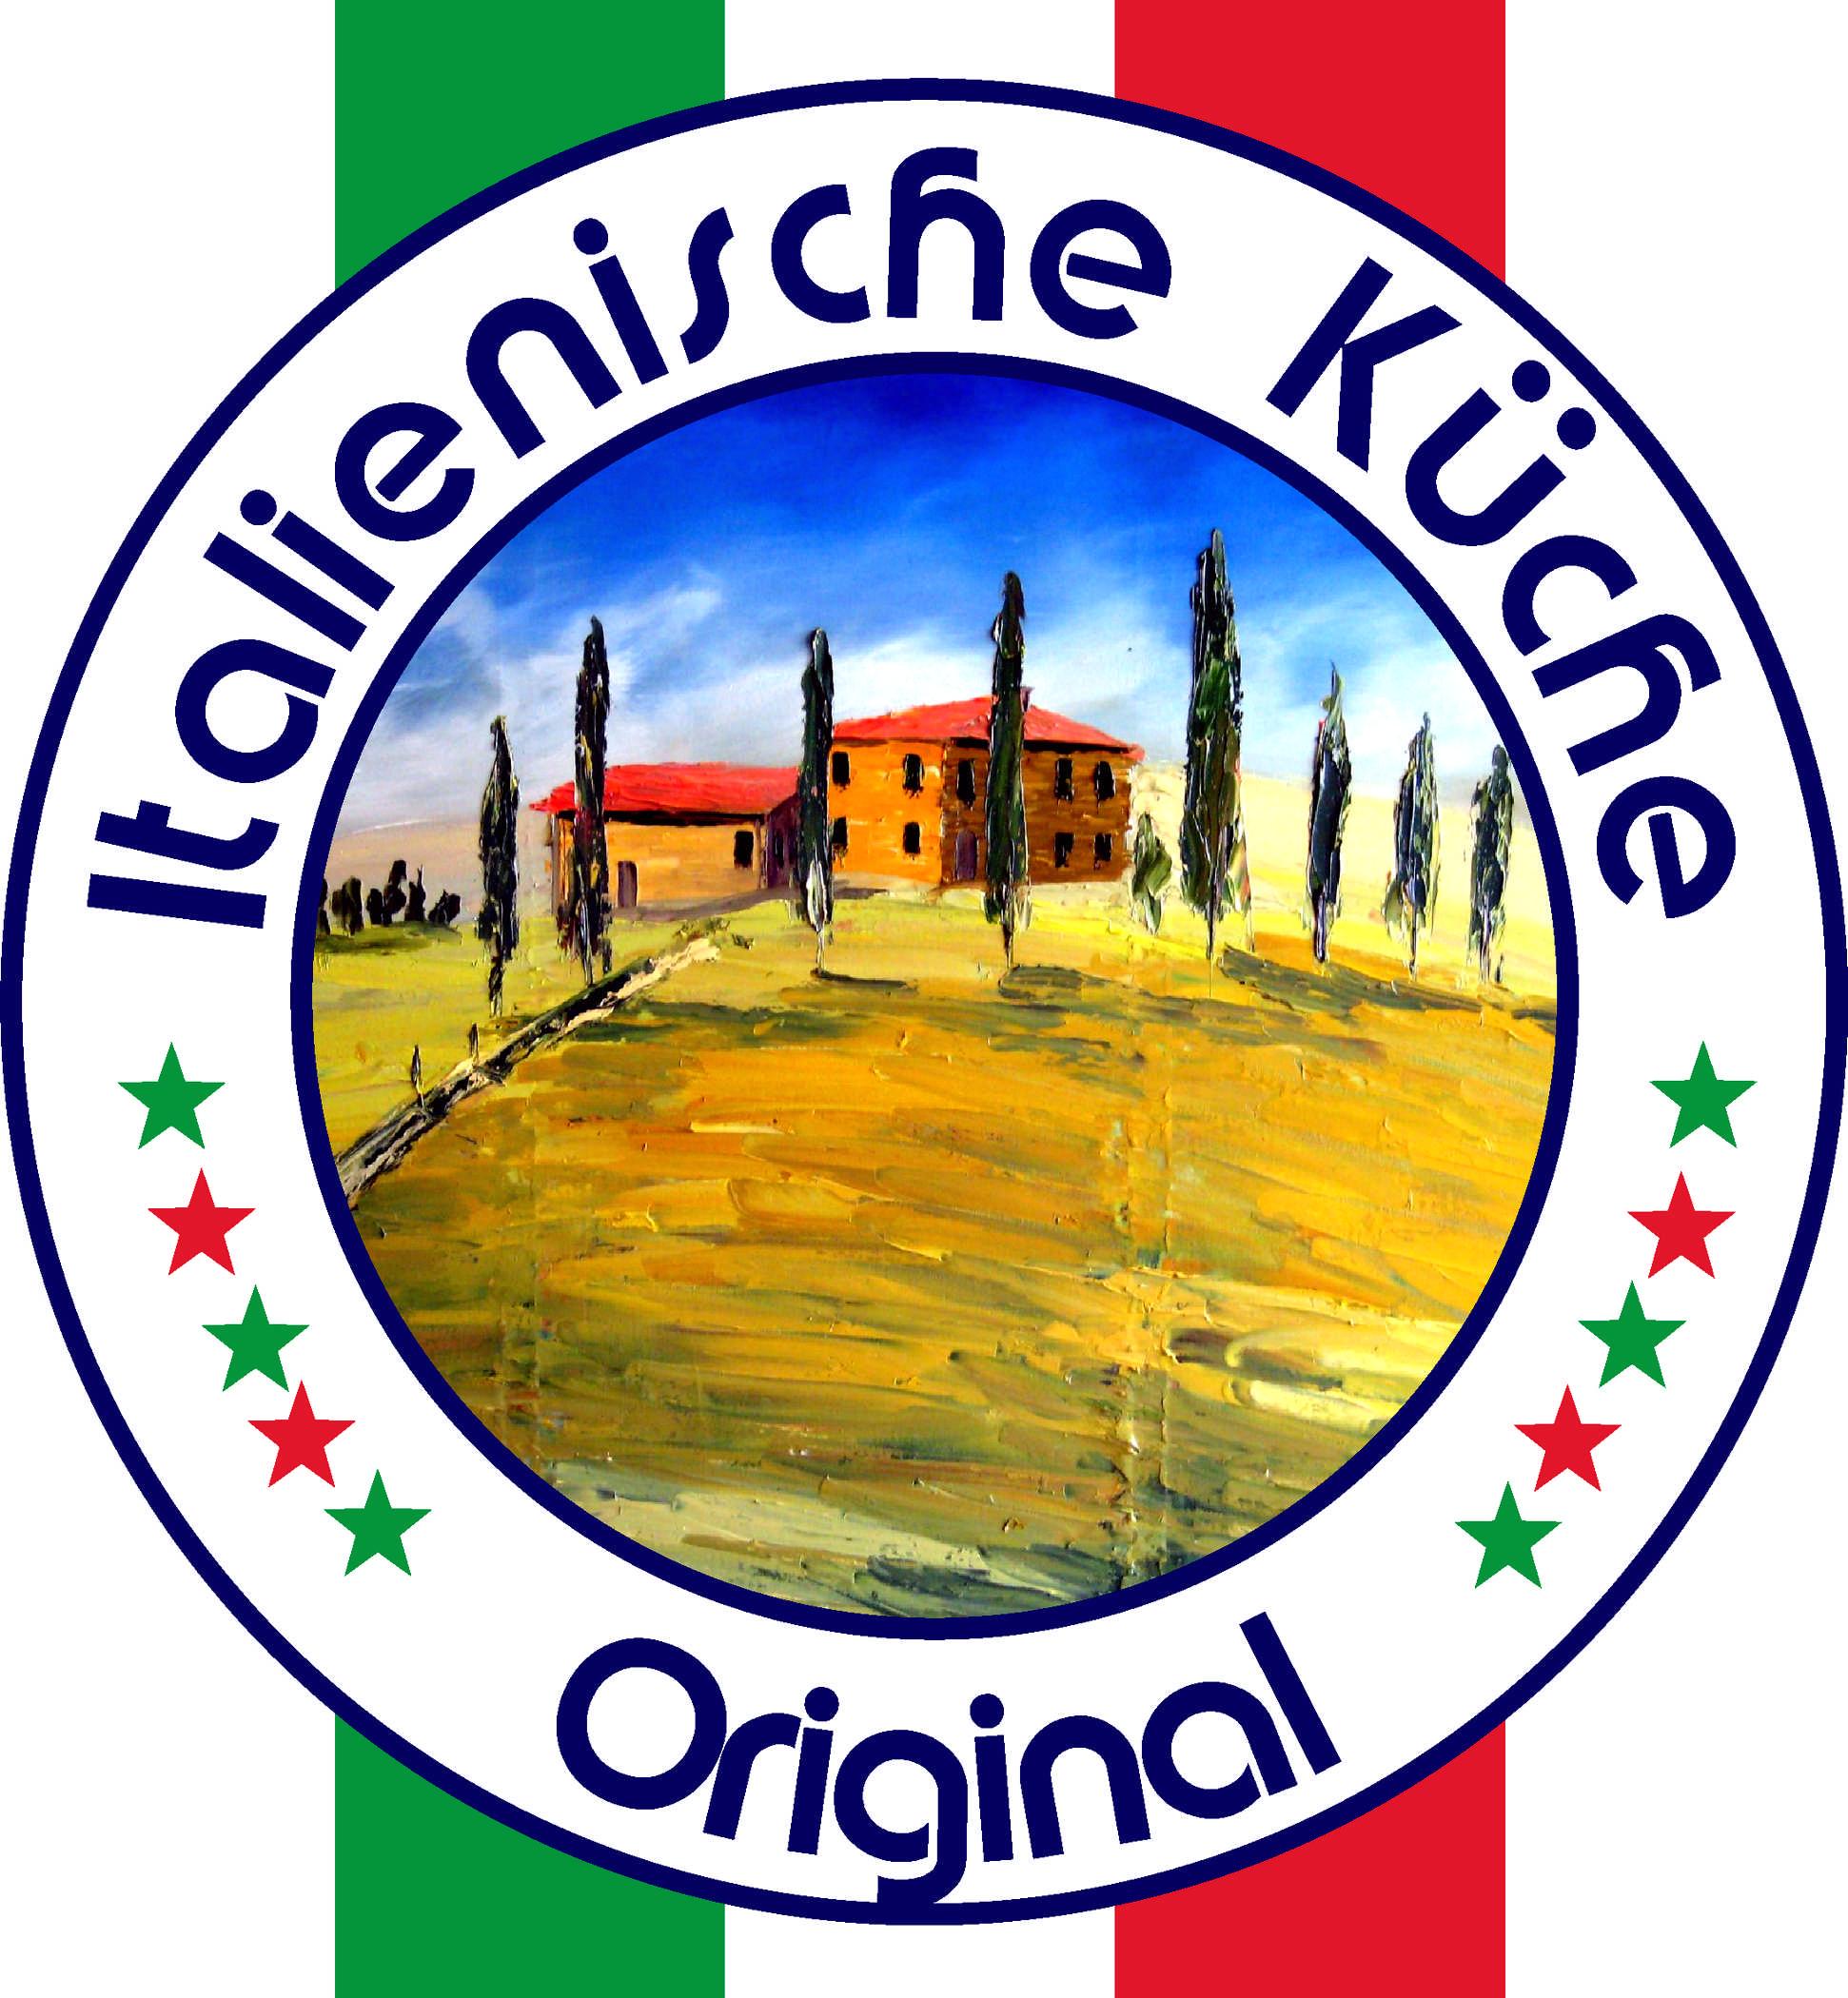 Download Logo Italienische Küche original Toscana Dipinto toscany ...